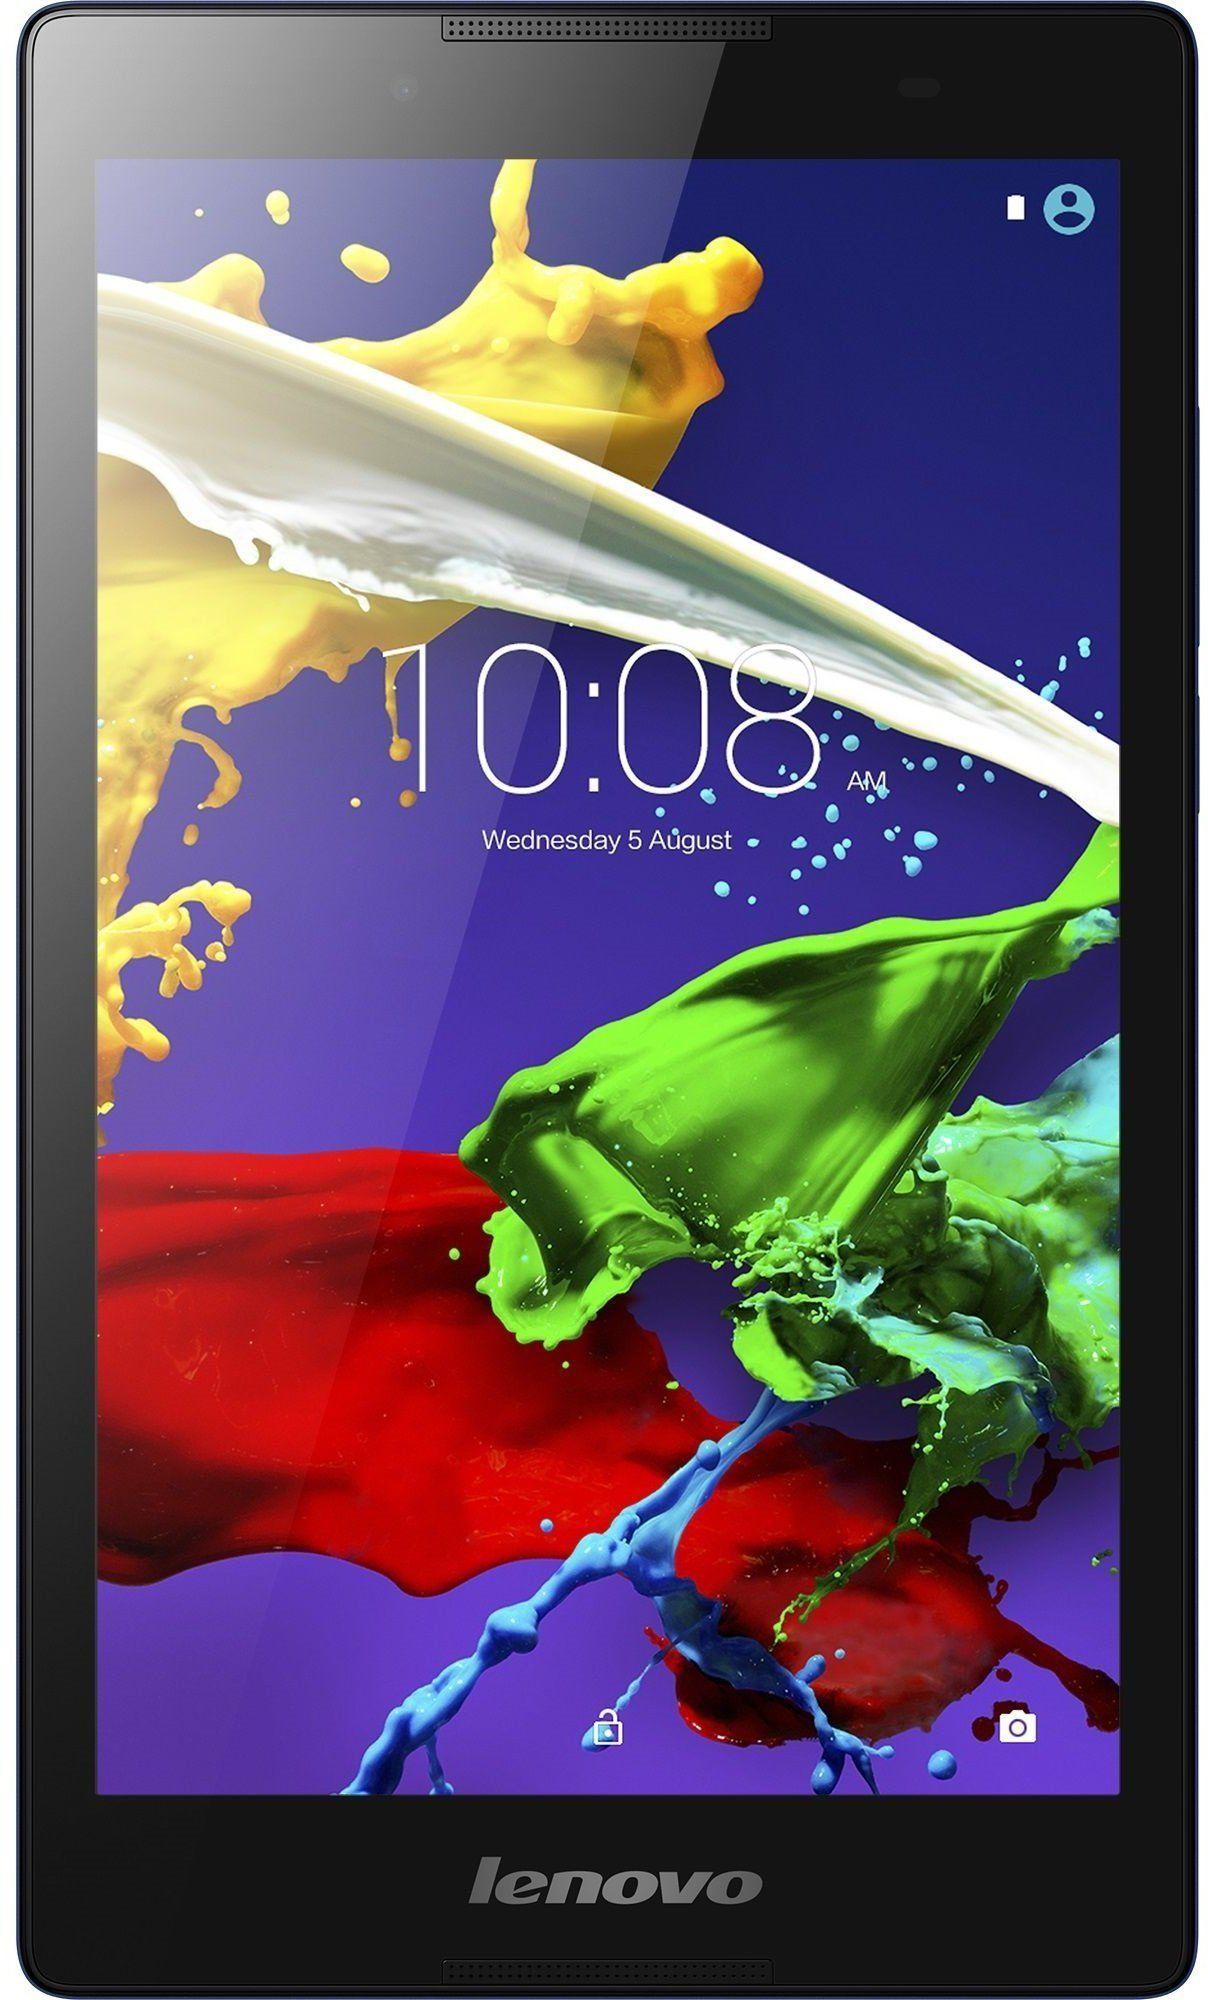 LENOVO TAB2 A850F 8 Lenovo, Pandora screenshot, Iphone